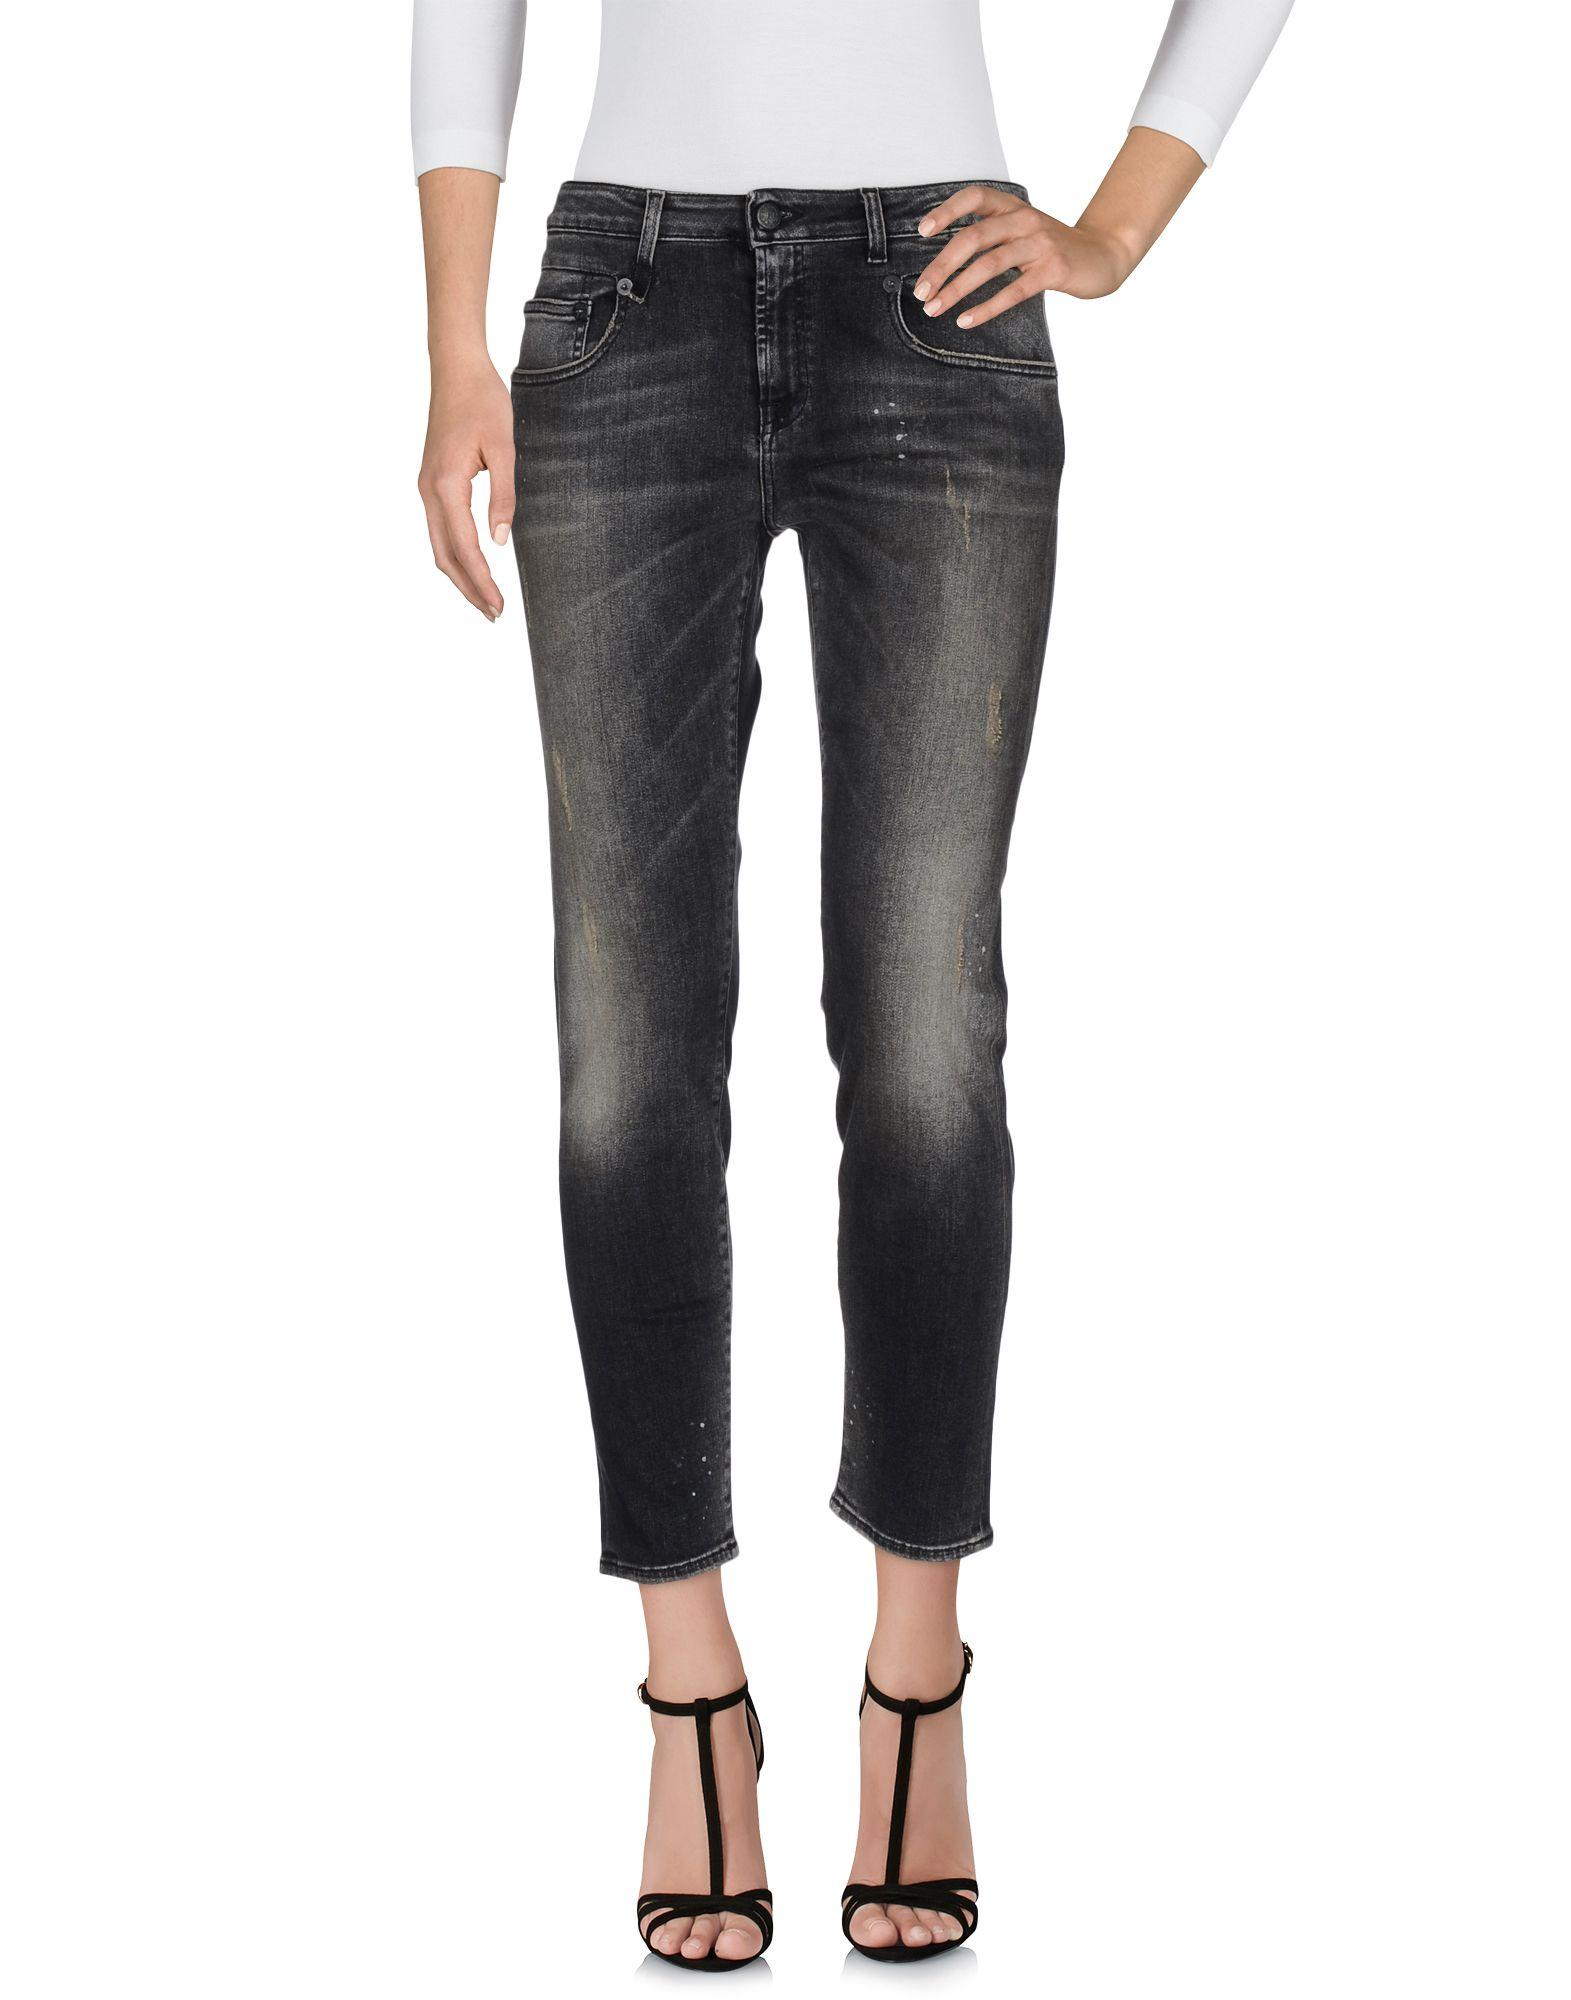 Pantaloni Jeans R13 Donna - Acquista online su ypFLov4JA